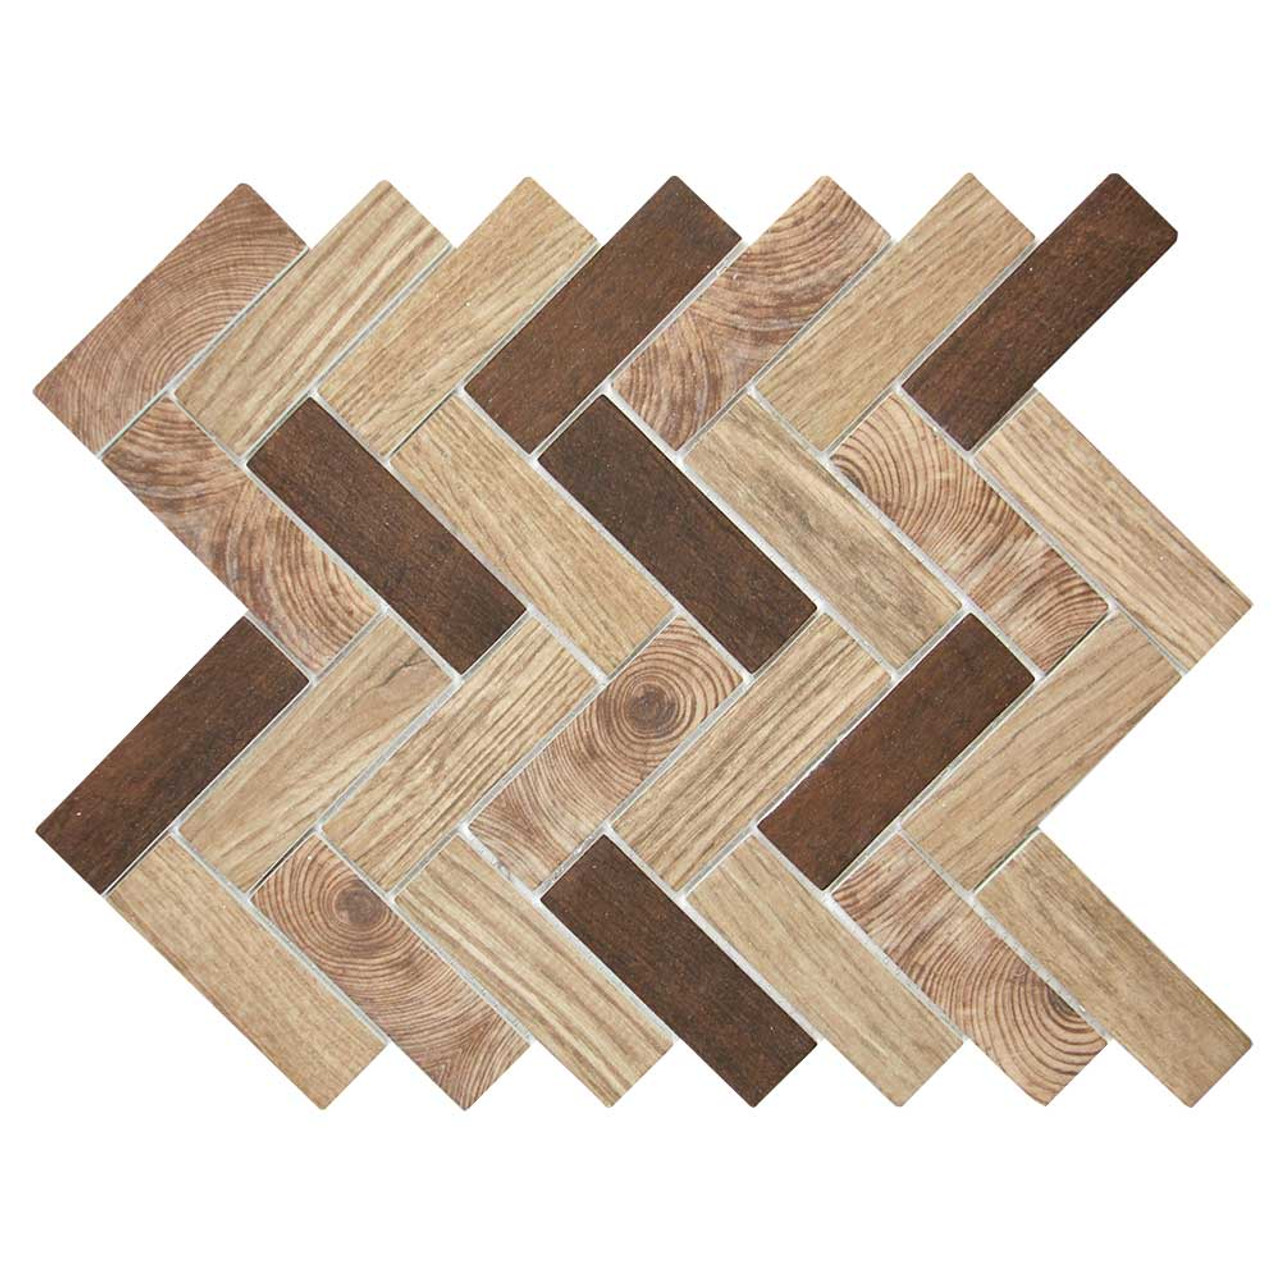 spigacycle wood caoba mix herringbone recycled glass tile